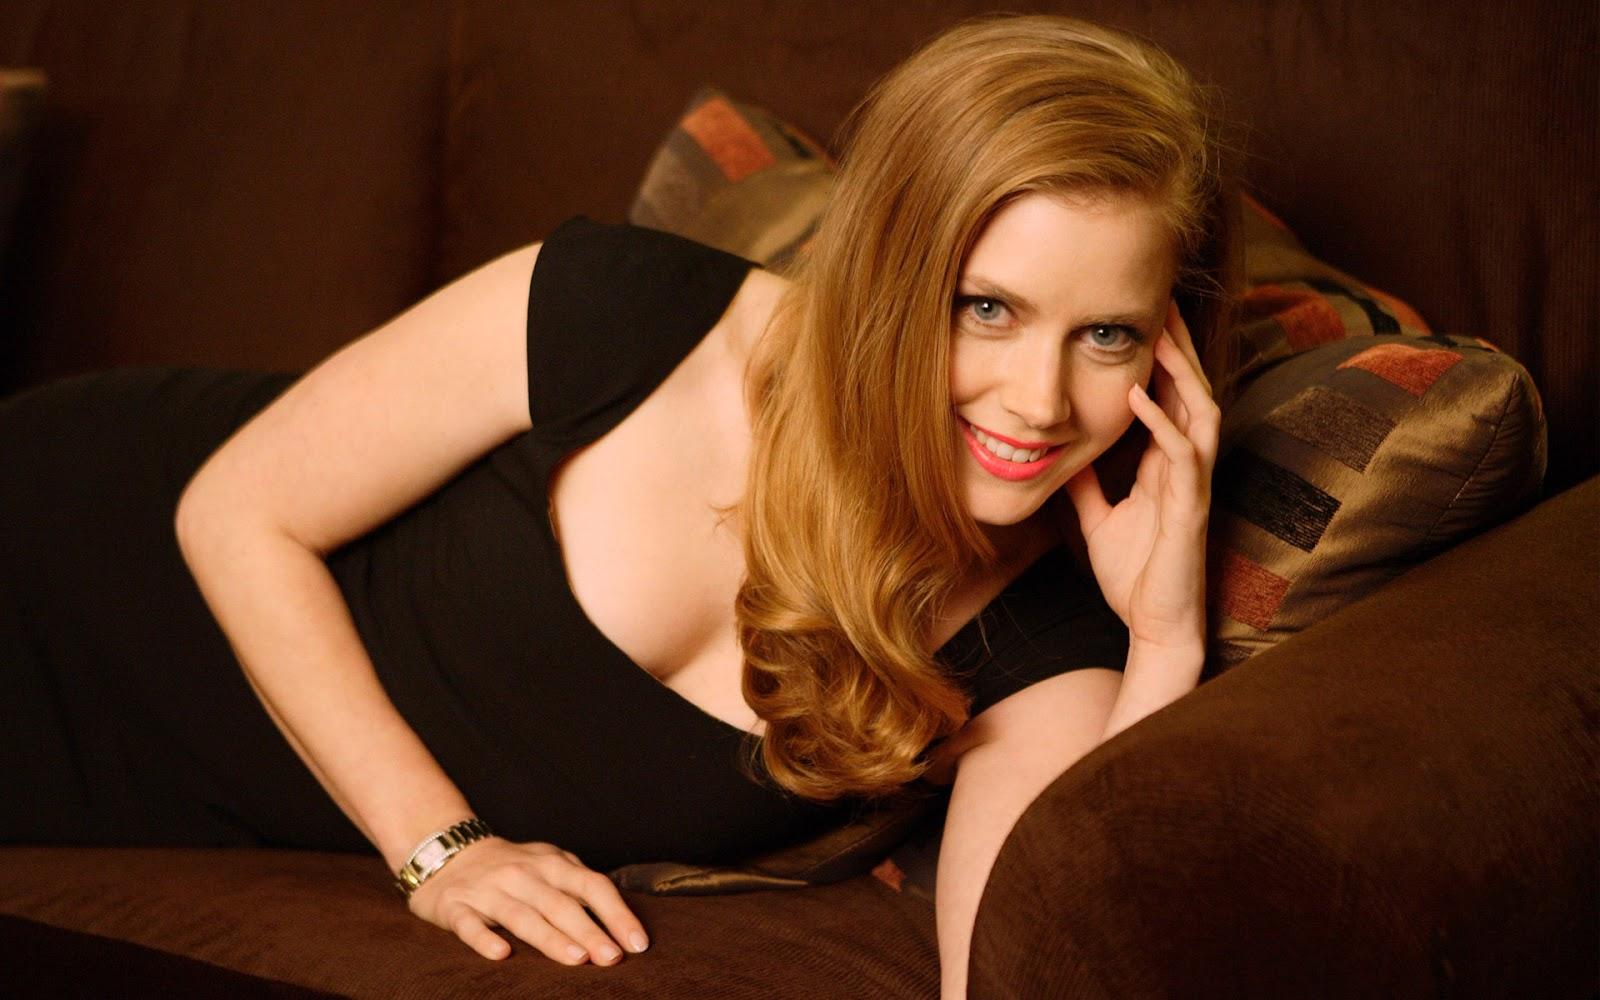 http://1.bp.blogspot.com/-QV2joHtcNcY/UOkcDTZC6cI/AAAAAAAAJ2Q/8tq3go5arIo/s1600/Amy+Adams-Wallpaper-5.jpg